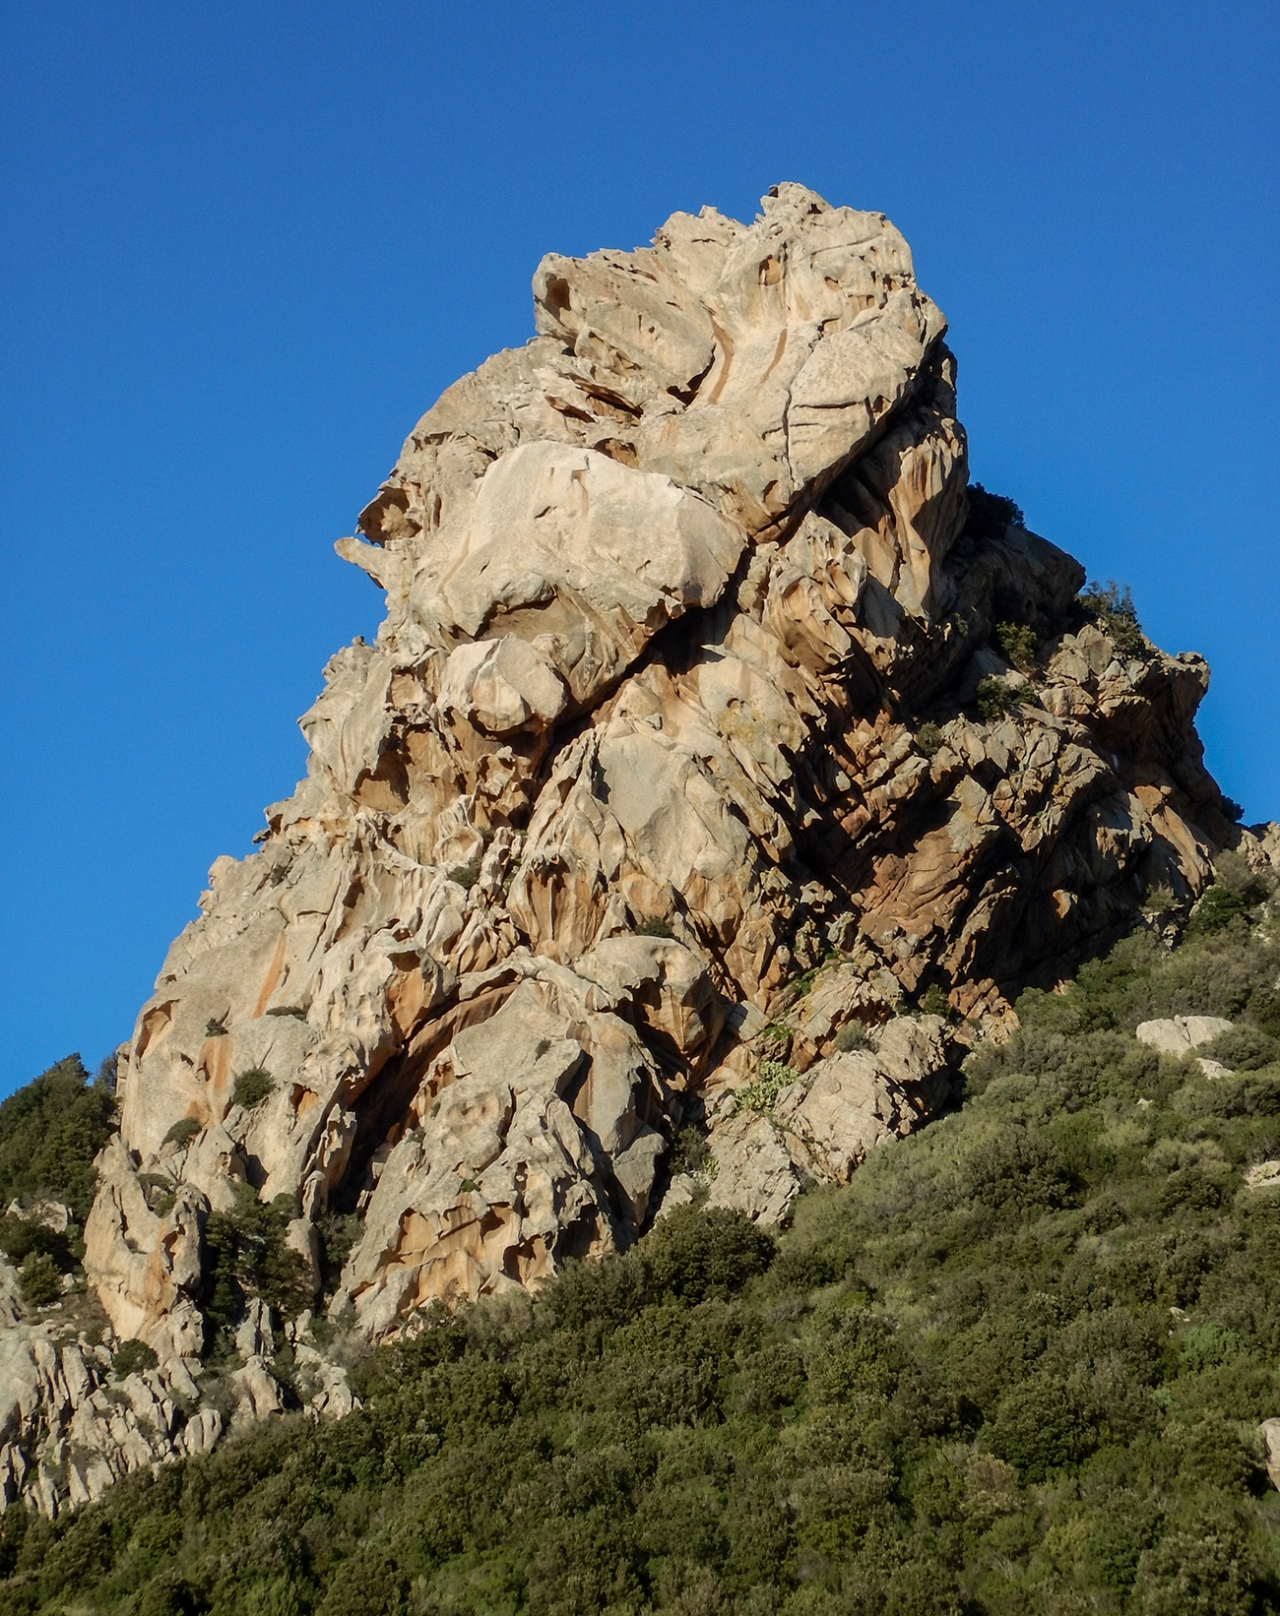 Balba Cana, a granite peak near San Pantaleo